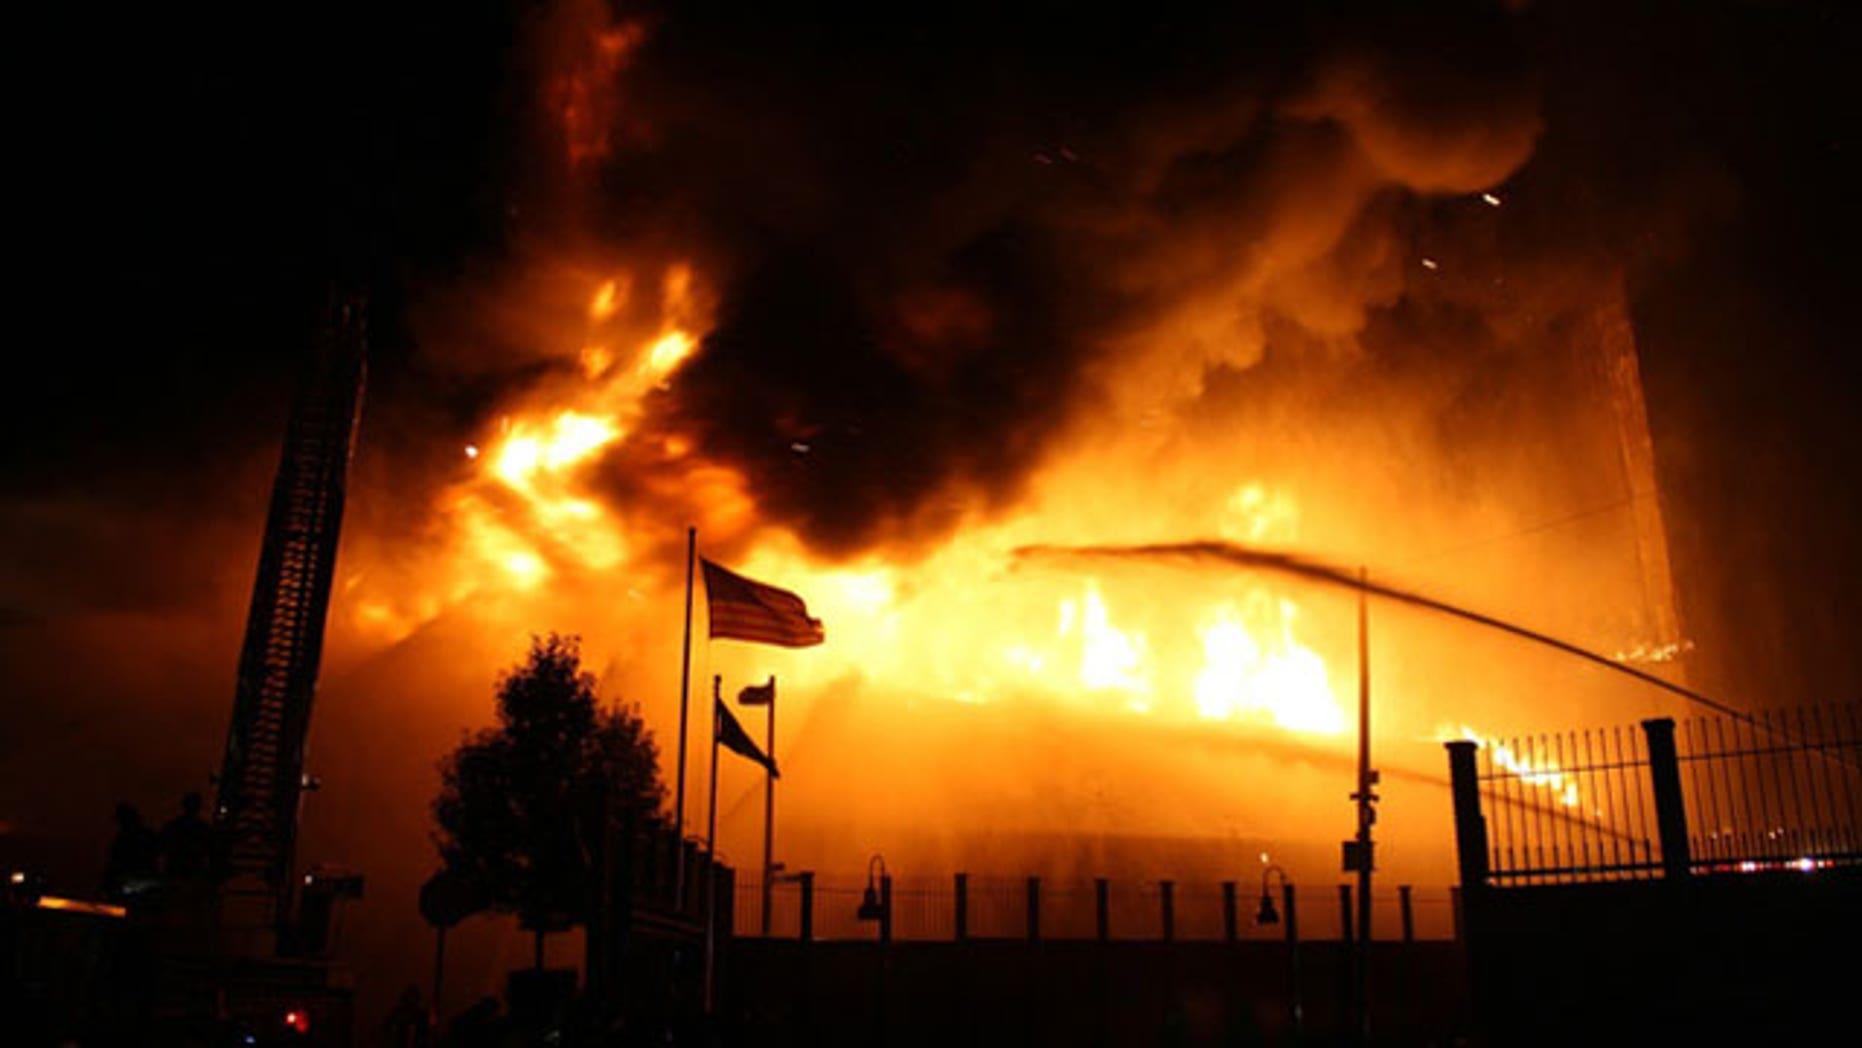 Fireworks Caused Boston's Massive Warehouse Blaze